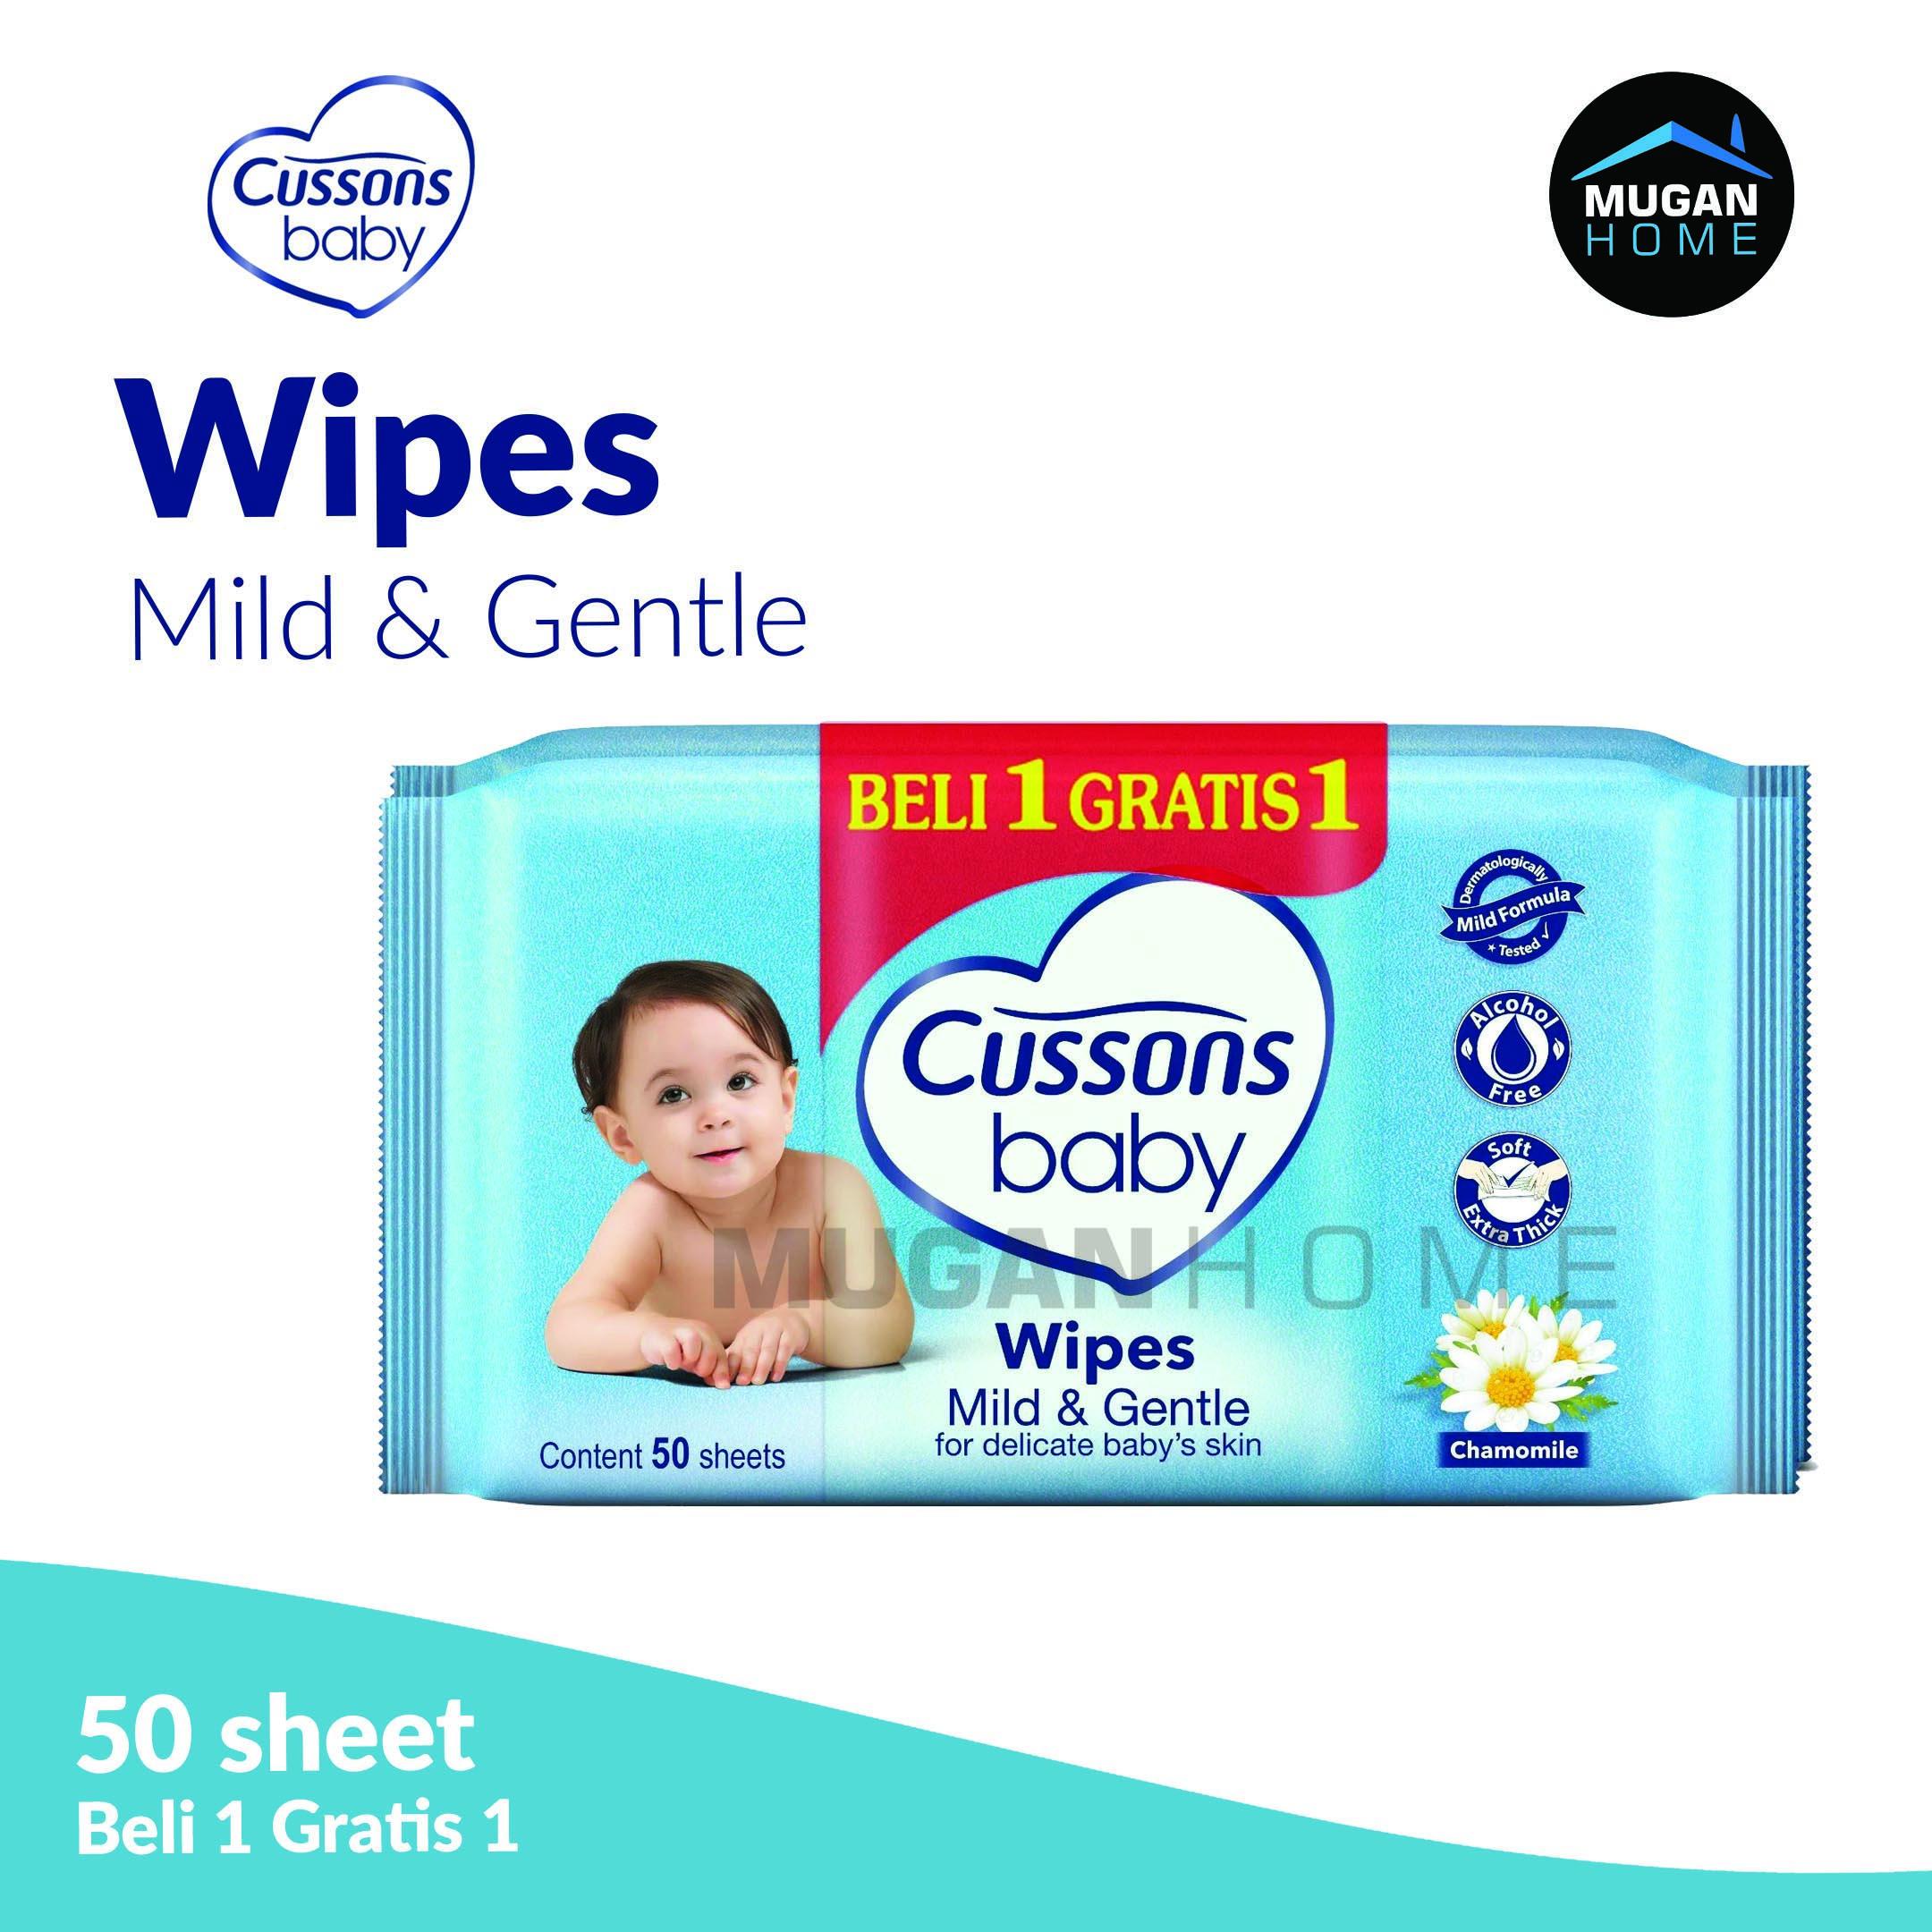 CUSSONS BABY WIPES 50SHEETS MILD & GENTLE BUY 1 GET 1